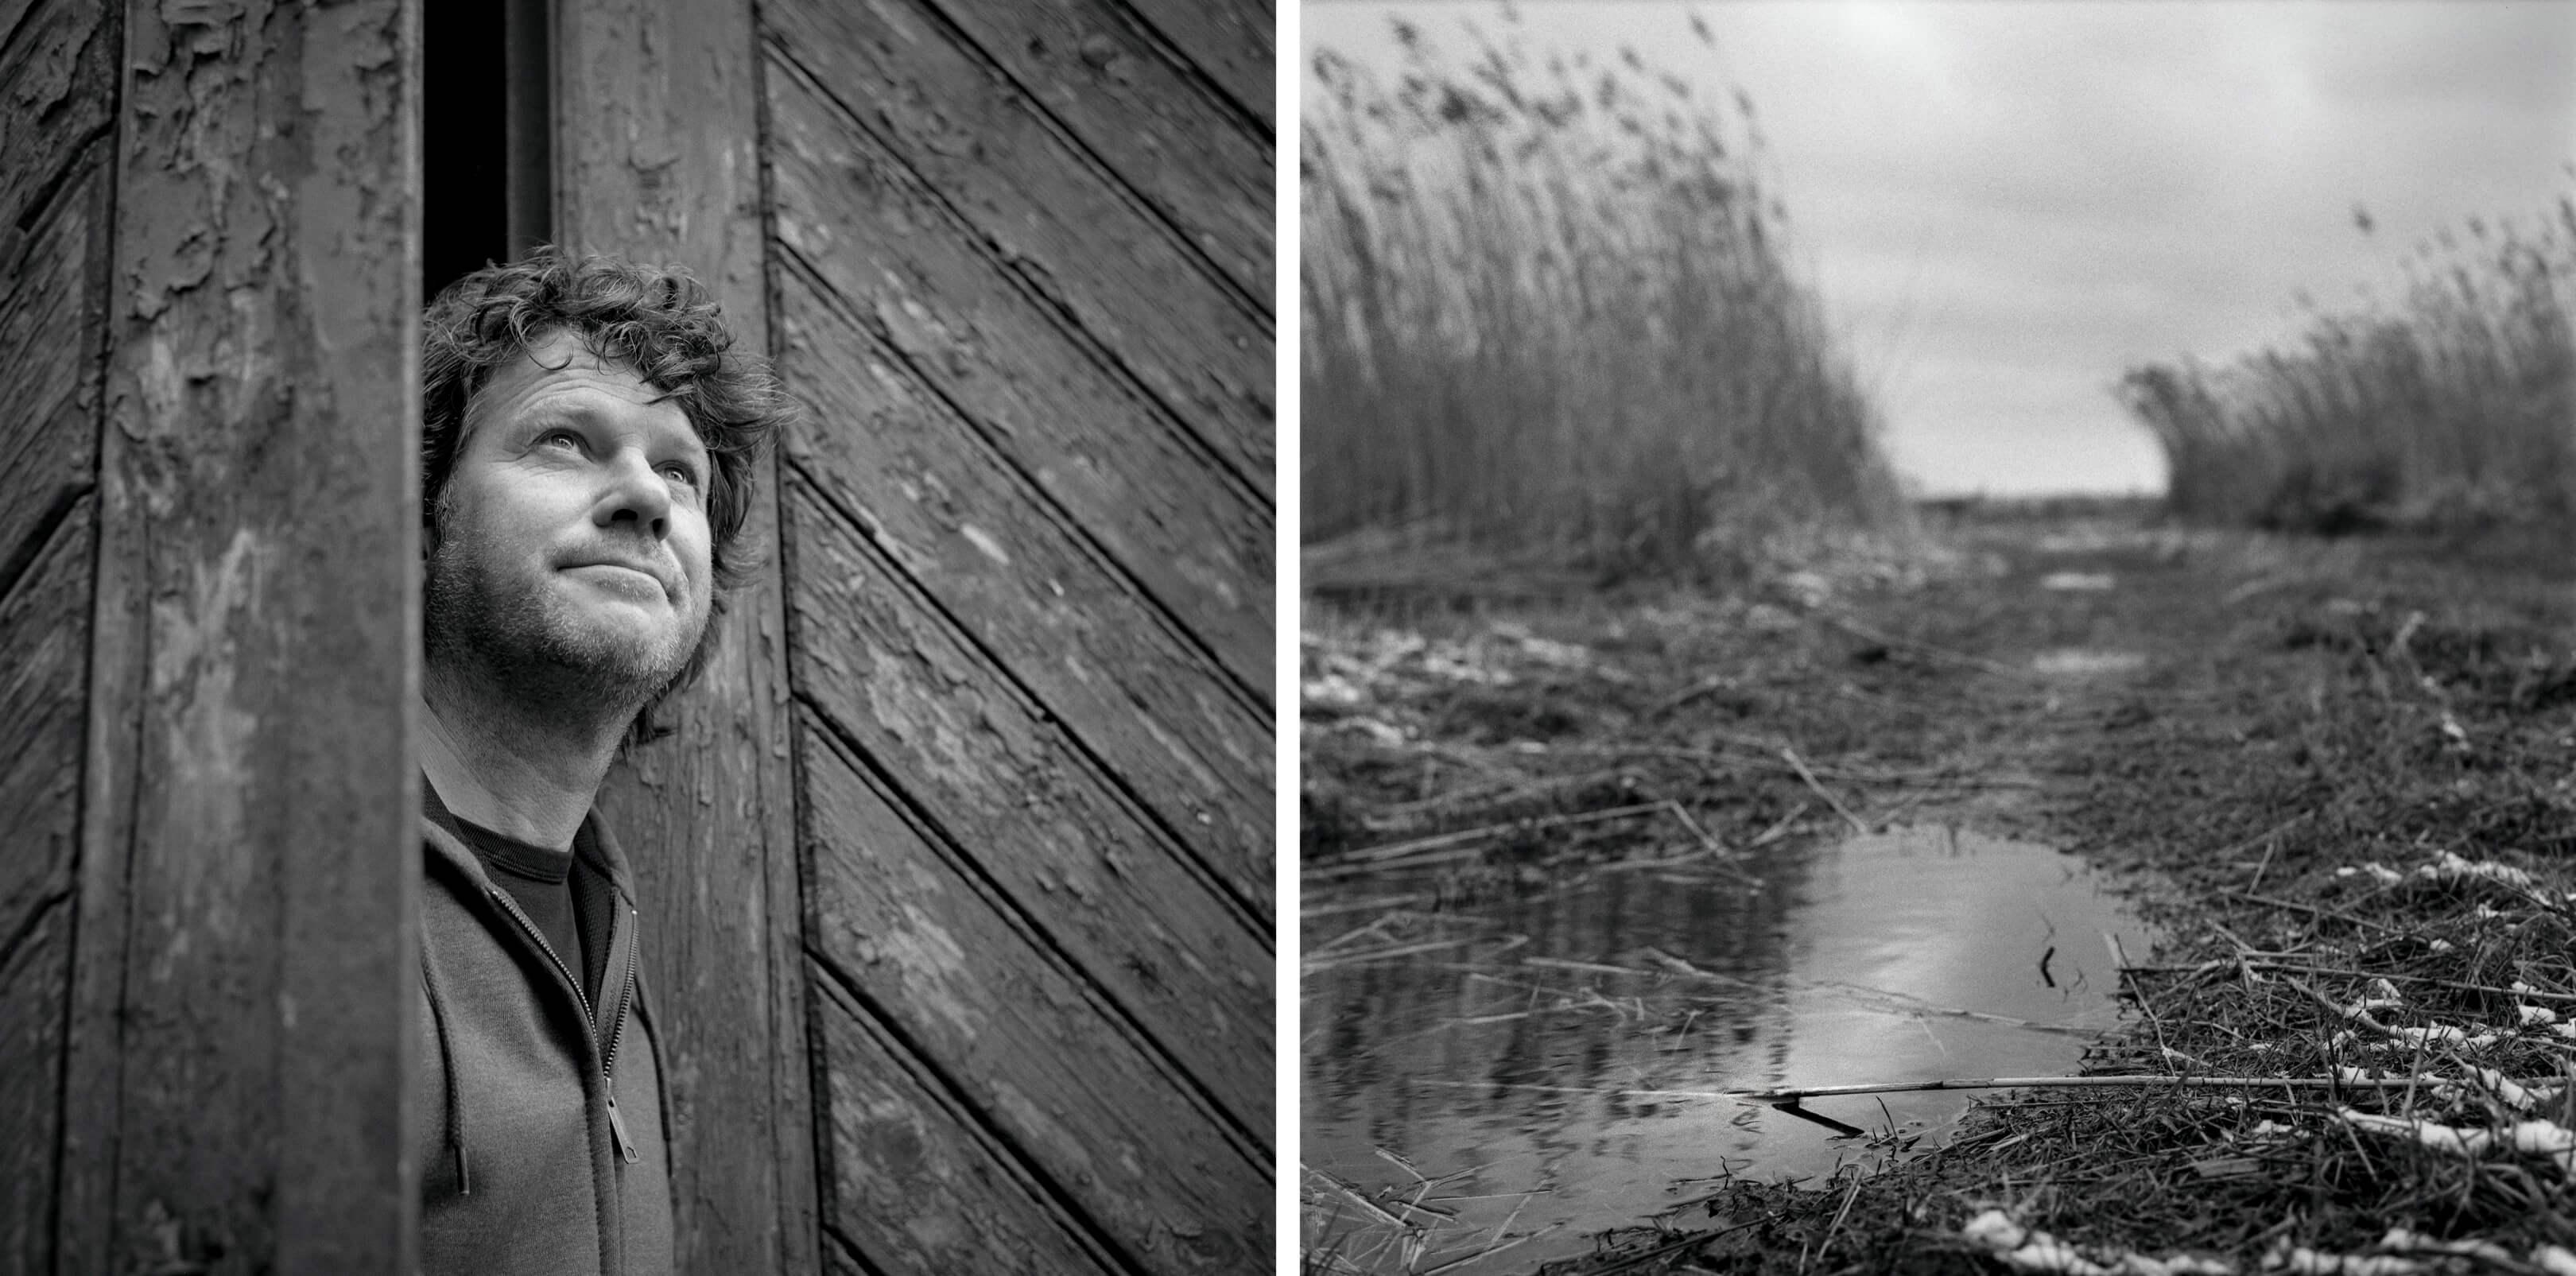 Jurjen Poeles Fotografie Jur portret landschap fragment adempauze windstil staren in de stilte ademloos zwart wit zw kunst kunstfotografie Jelle